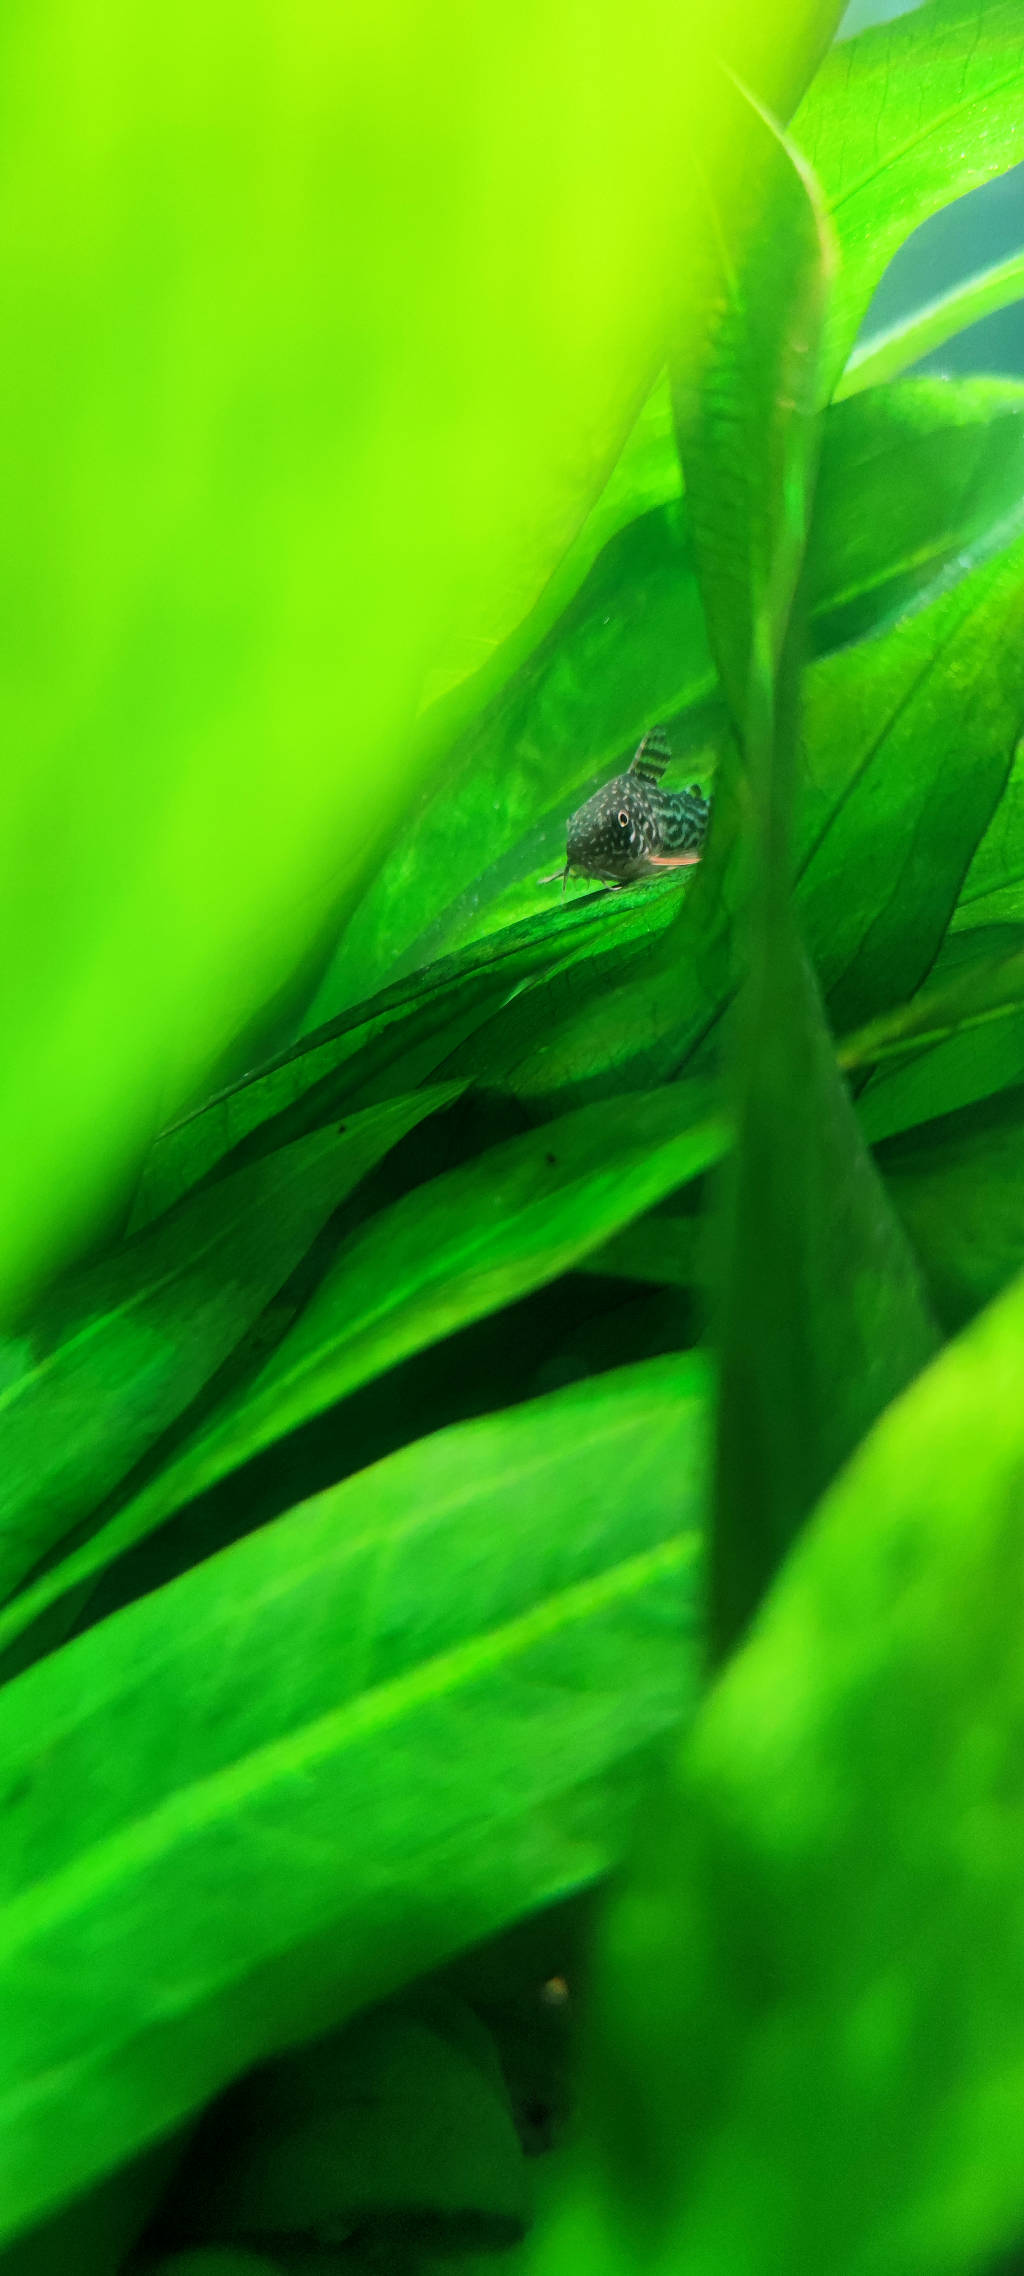 http://www.briandickens.nl/GoT/aquarium/2.jpg